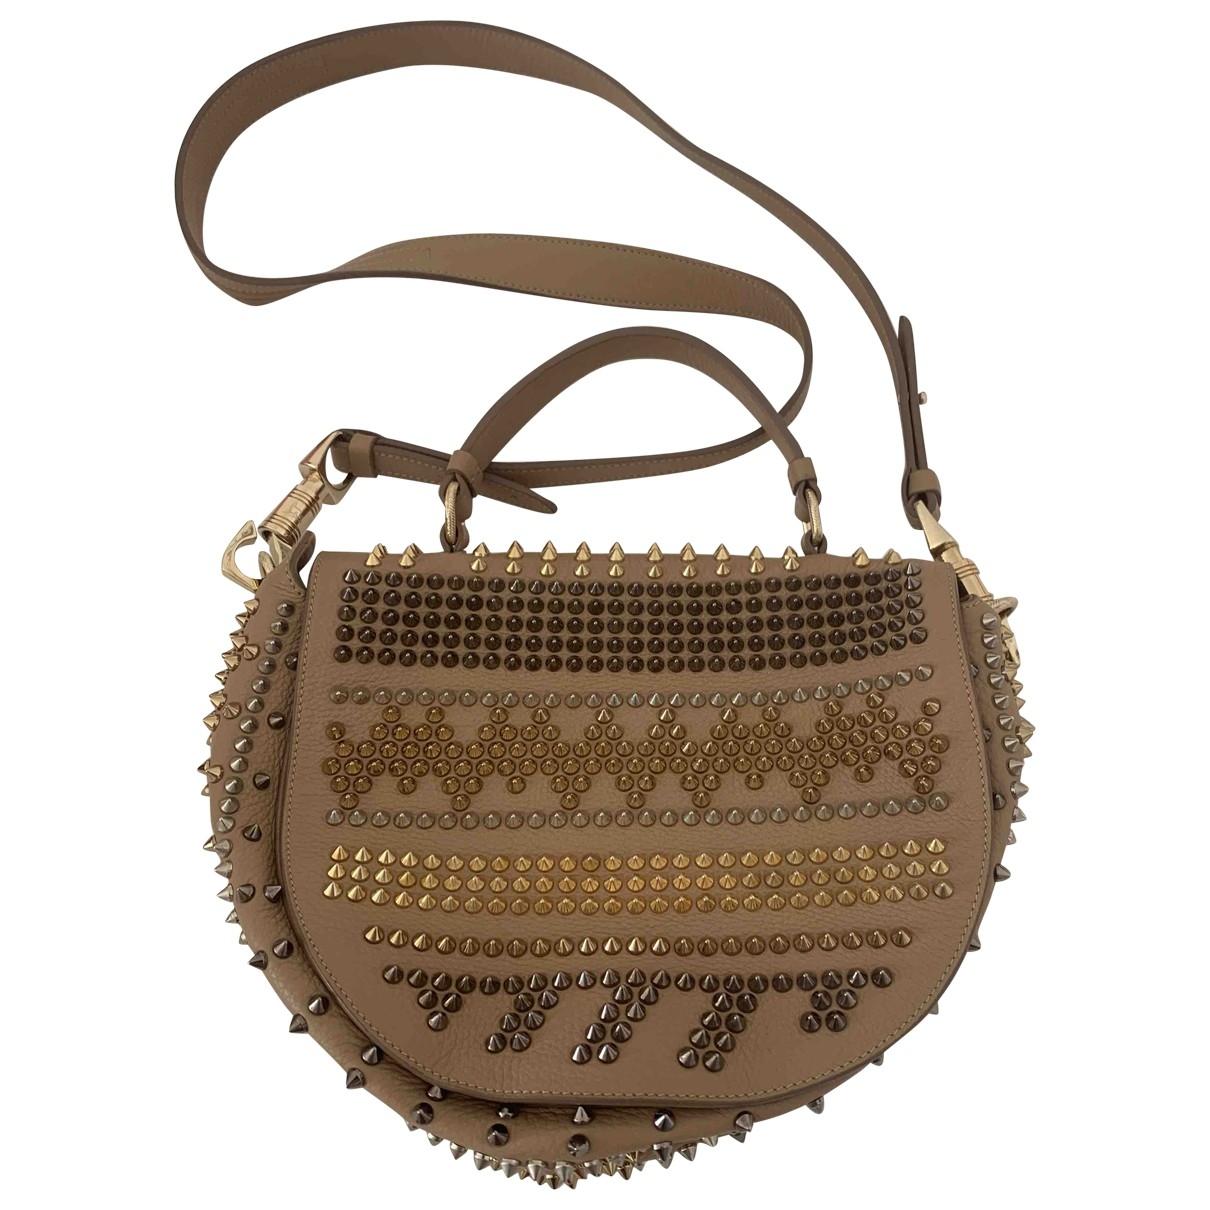 Christian Louboutin \N Beige Leather handbag for Women \N